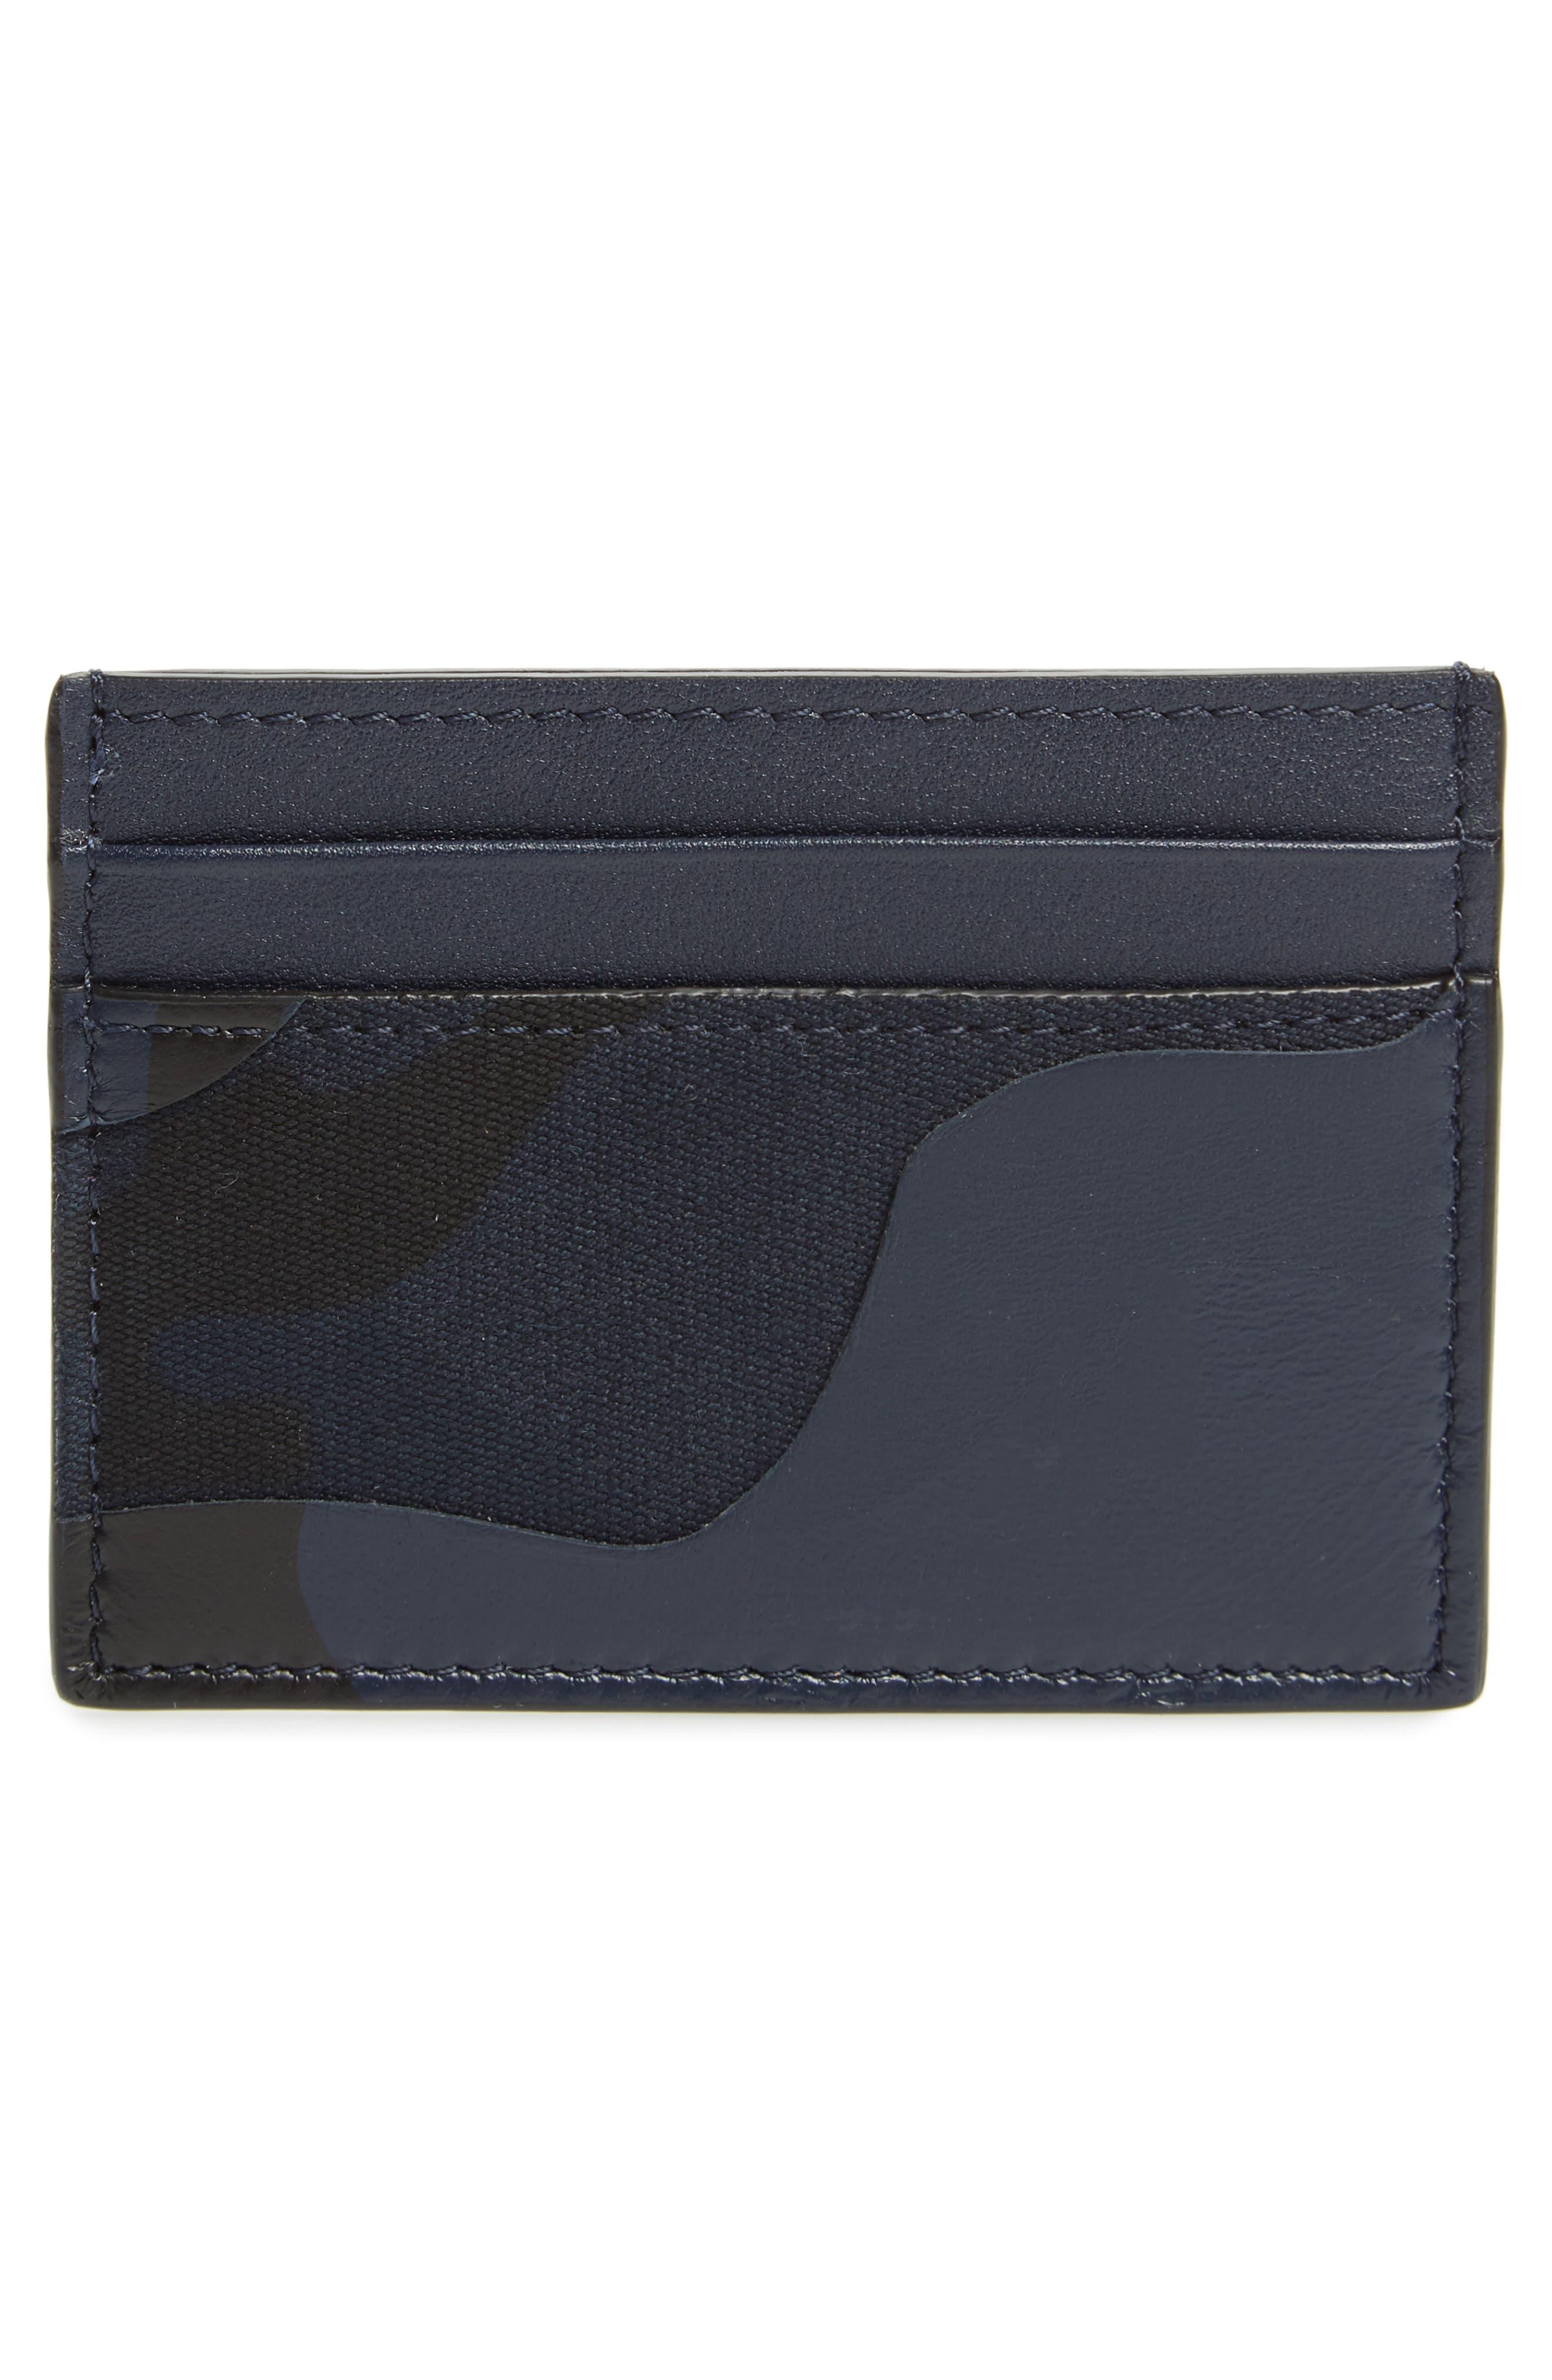 GARAVANI Camo Nylon & Leather Card Case,                             Alternate thumbnail 2, color,                             MARINE